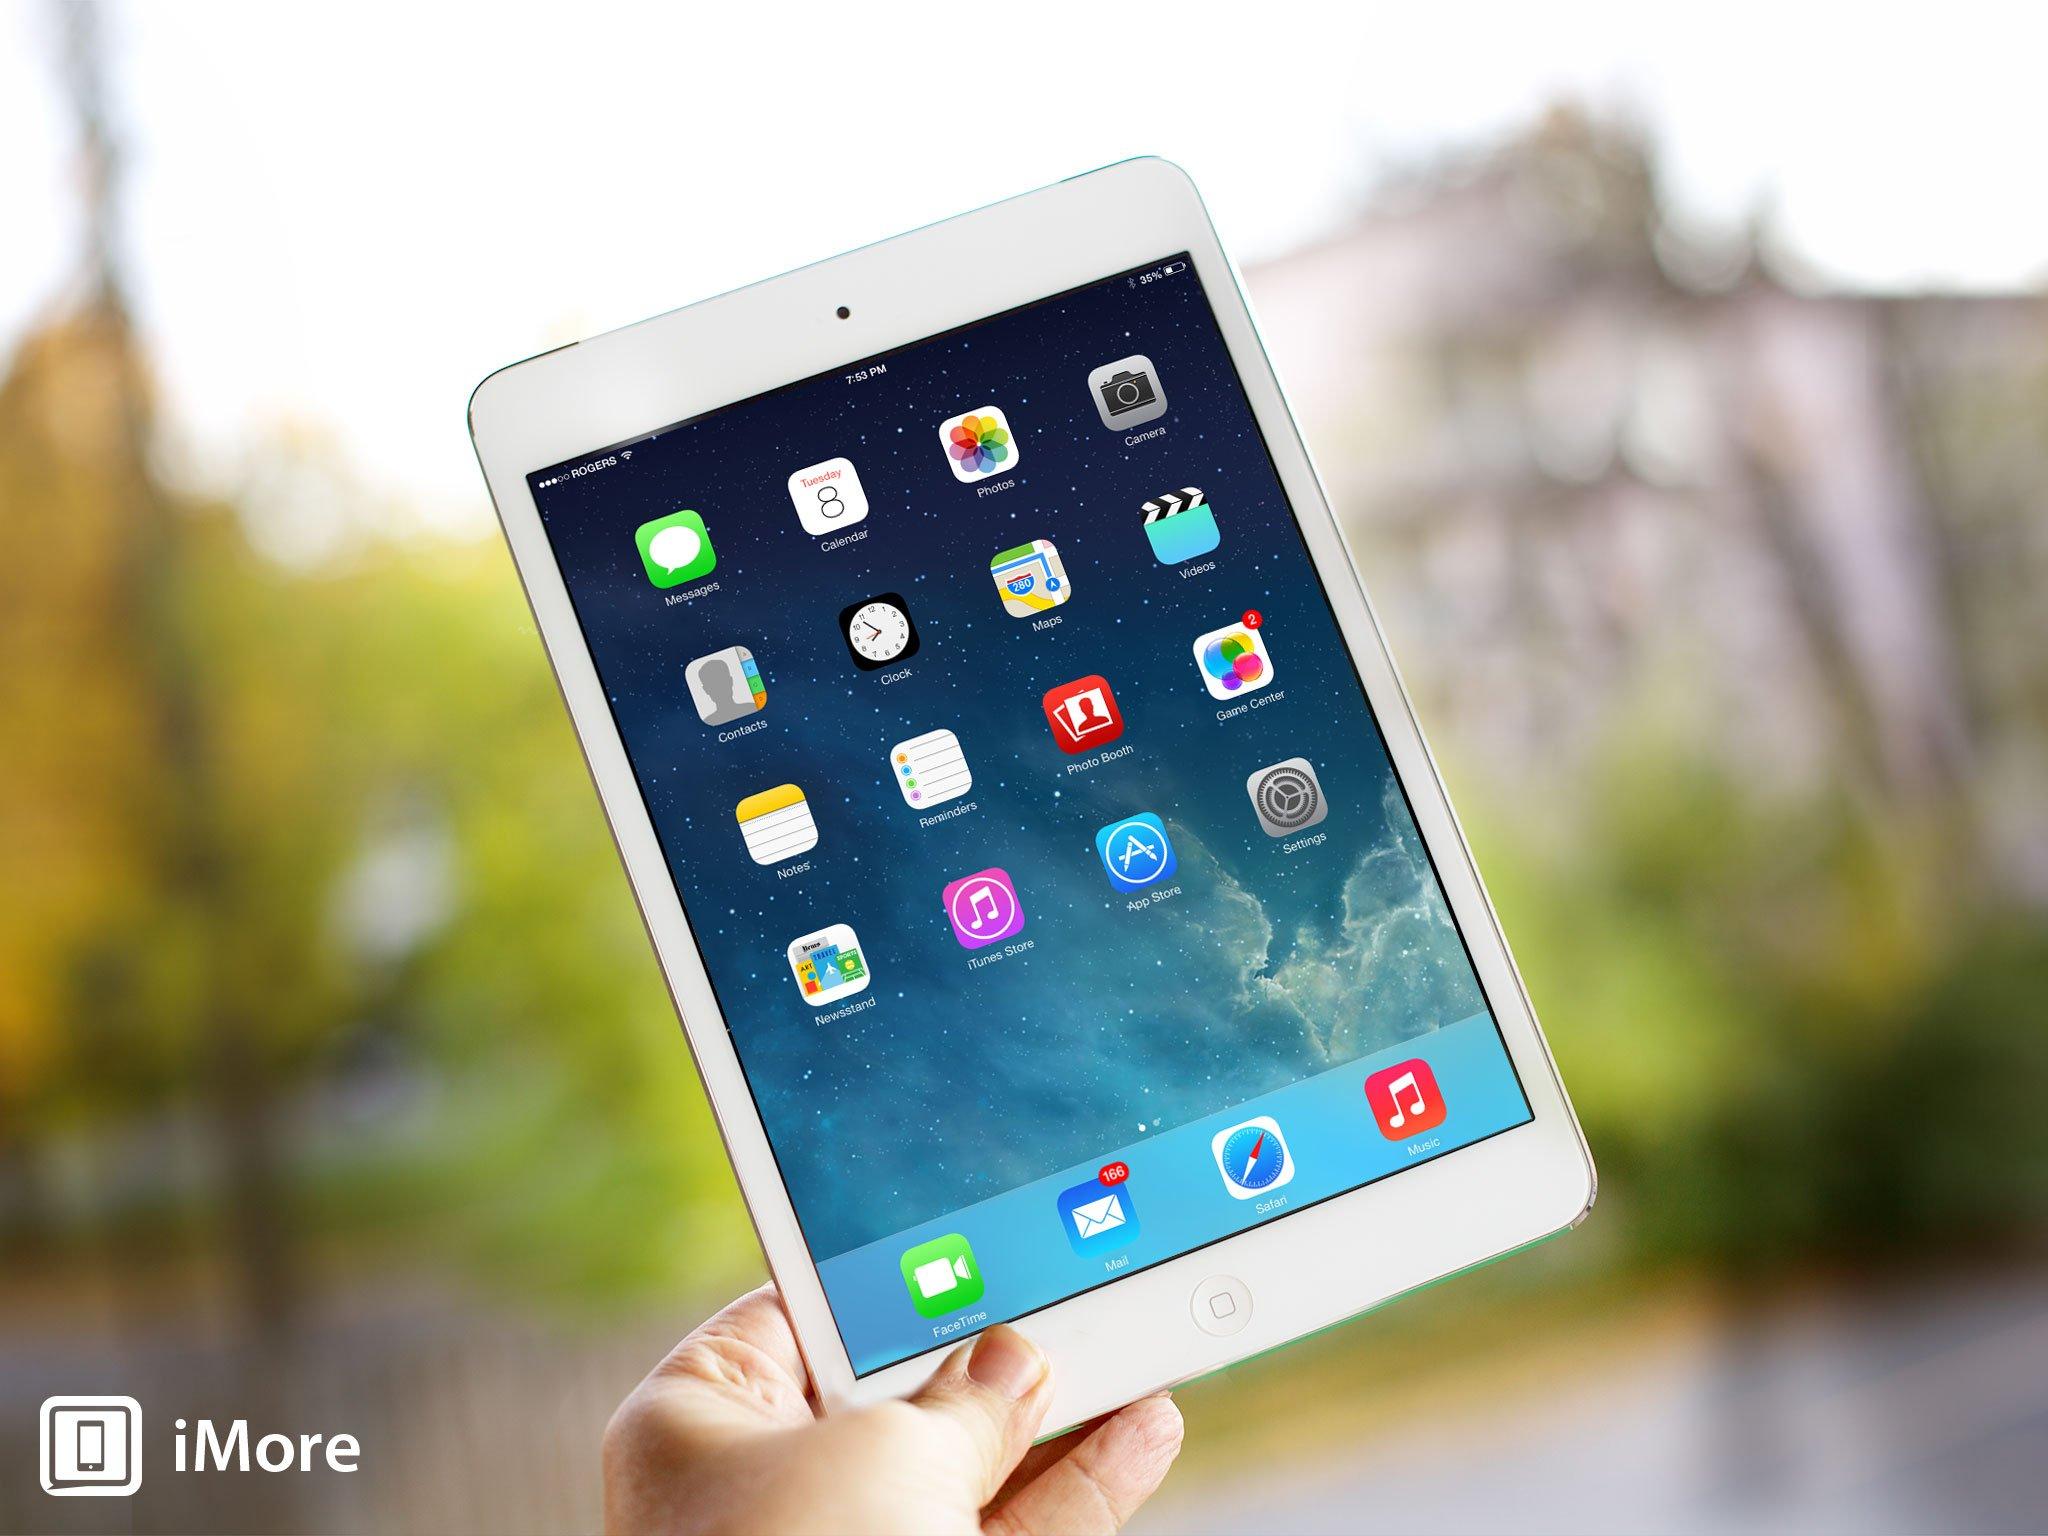 Imagining iPad 5: Lighter, thinner design